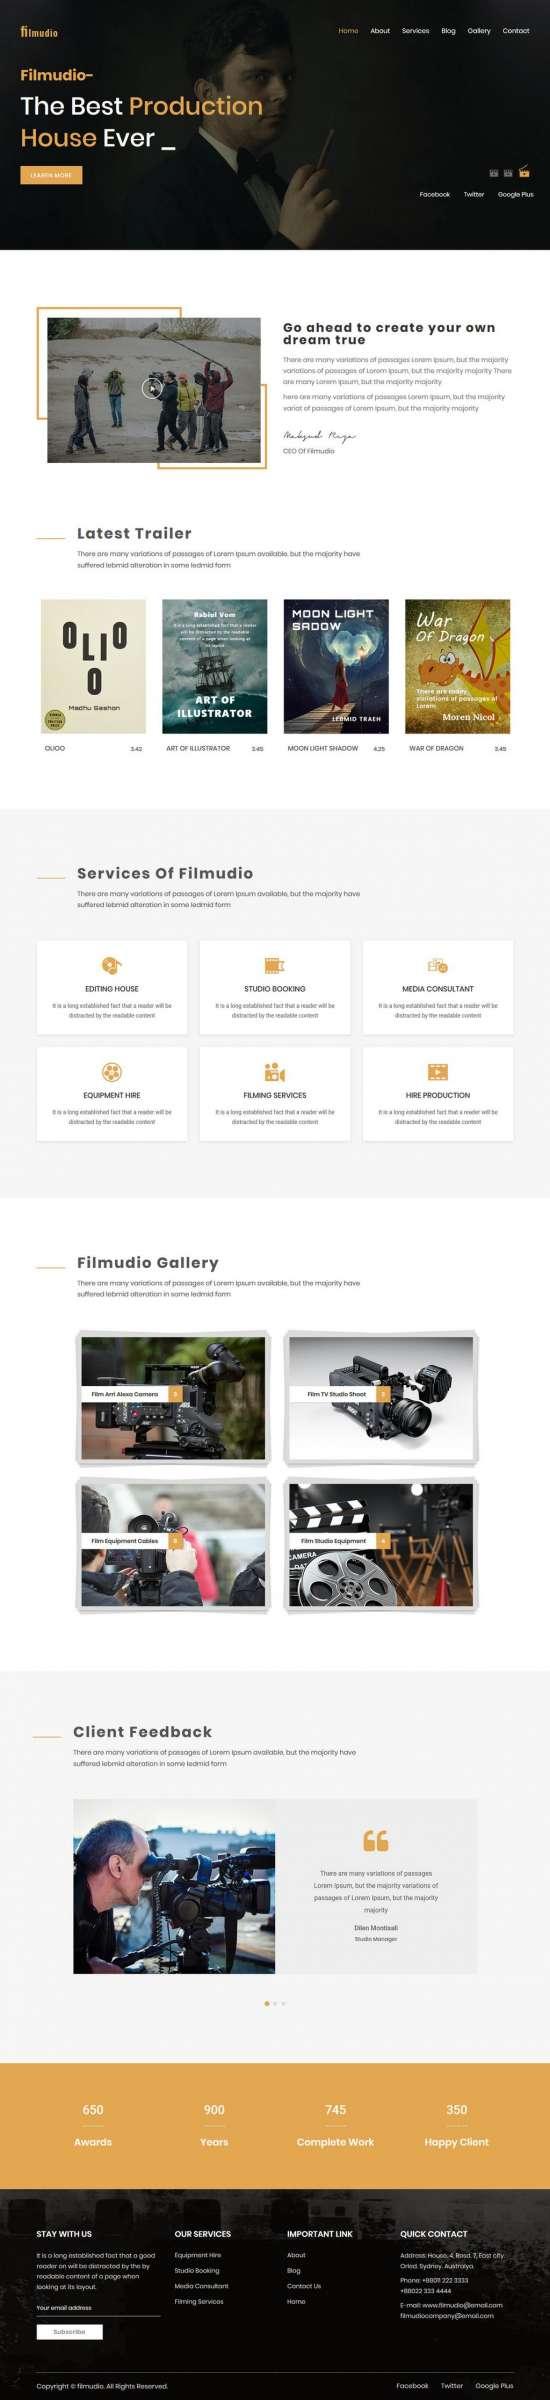 filmudio wordpress theme 01 550x2400 - Filmudio WordPress Theme